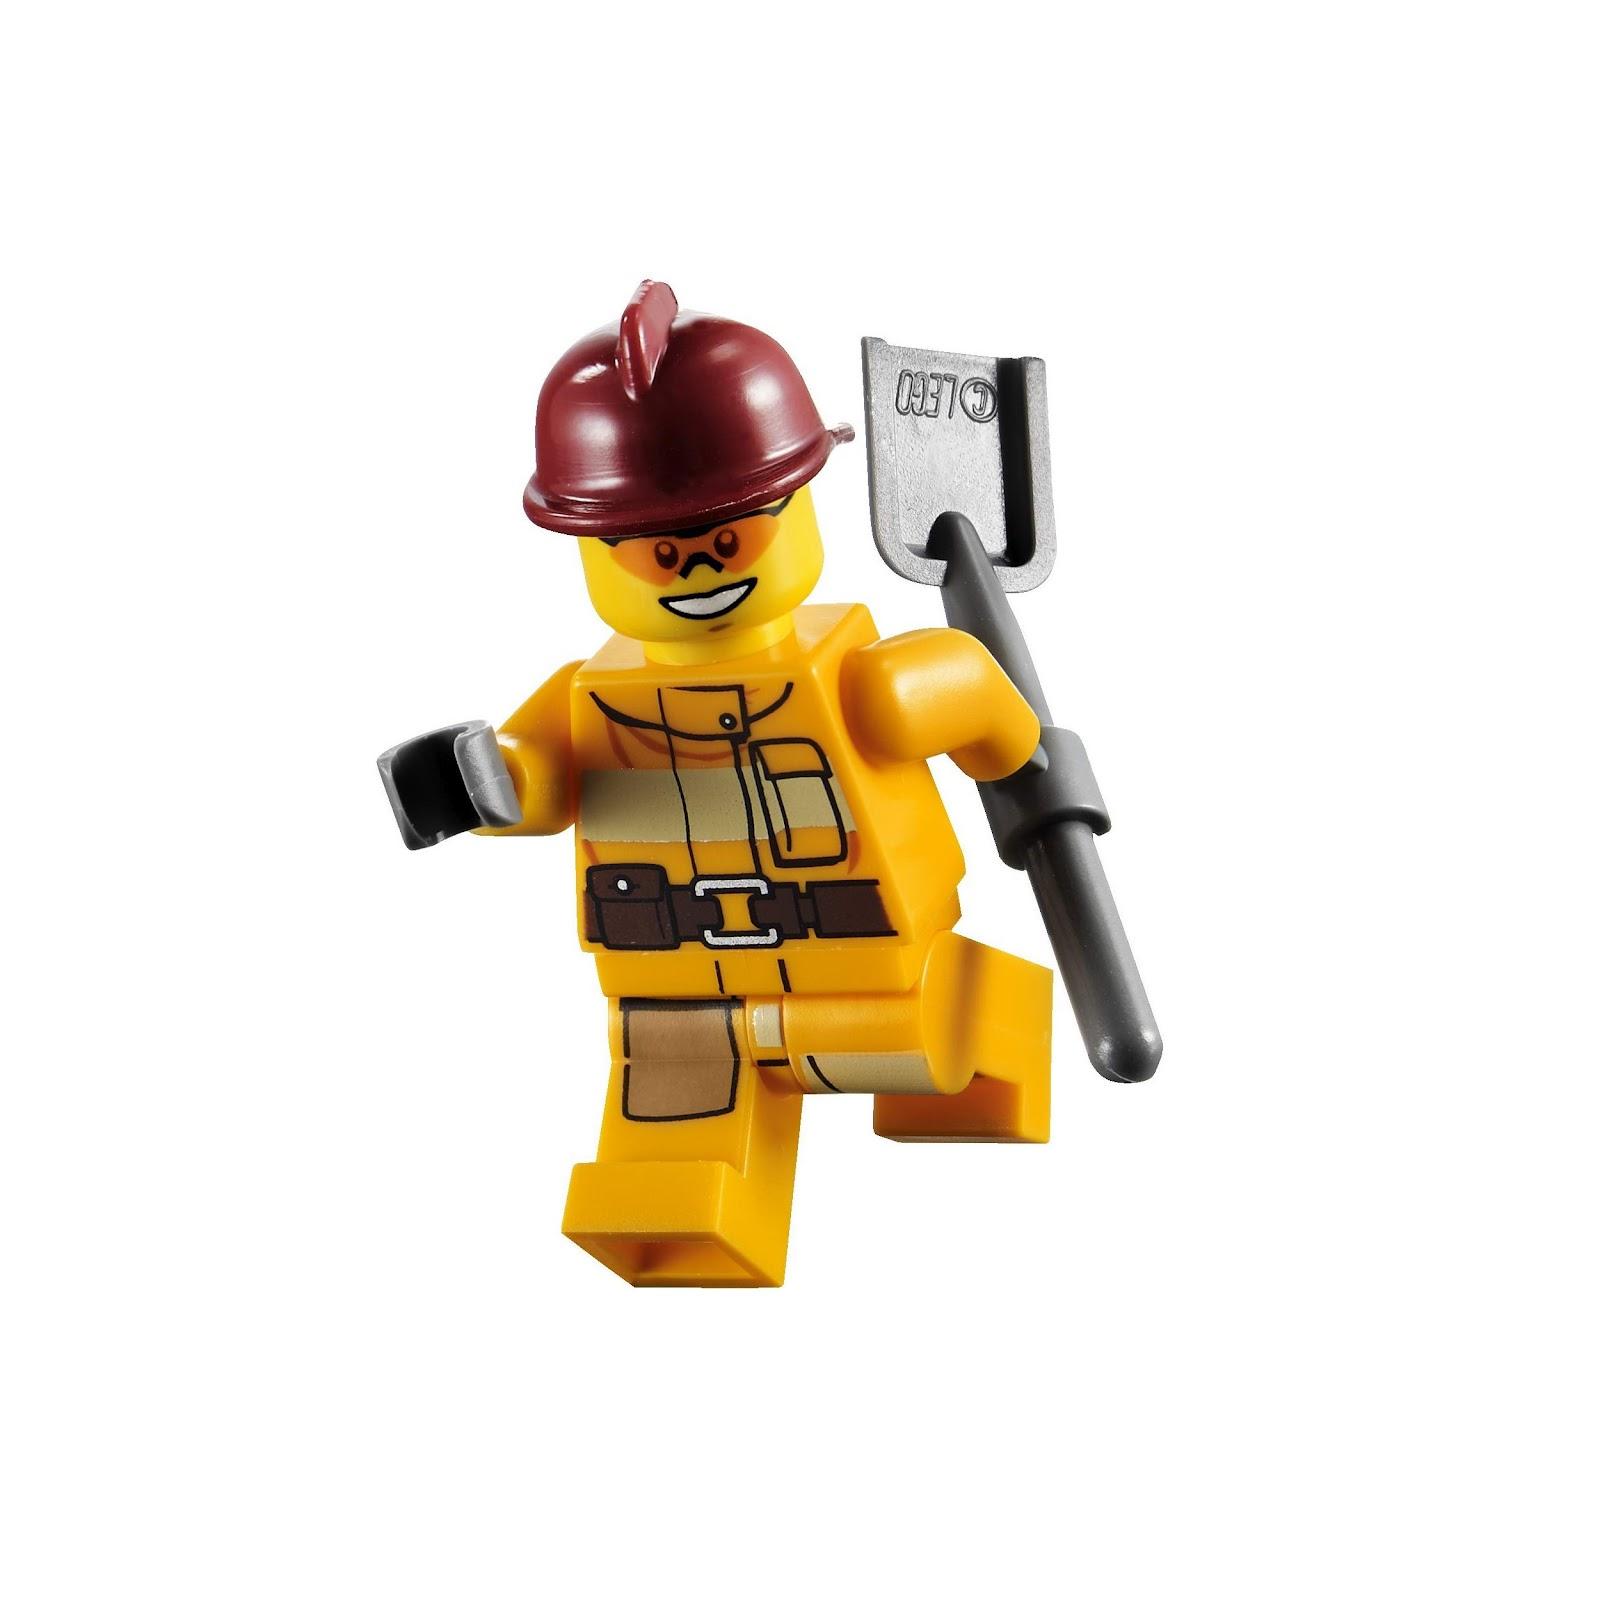 1600x1600 Lego Clipart Lego City